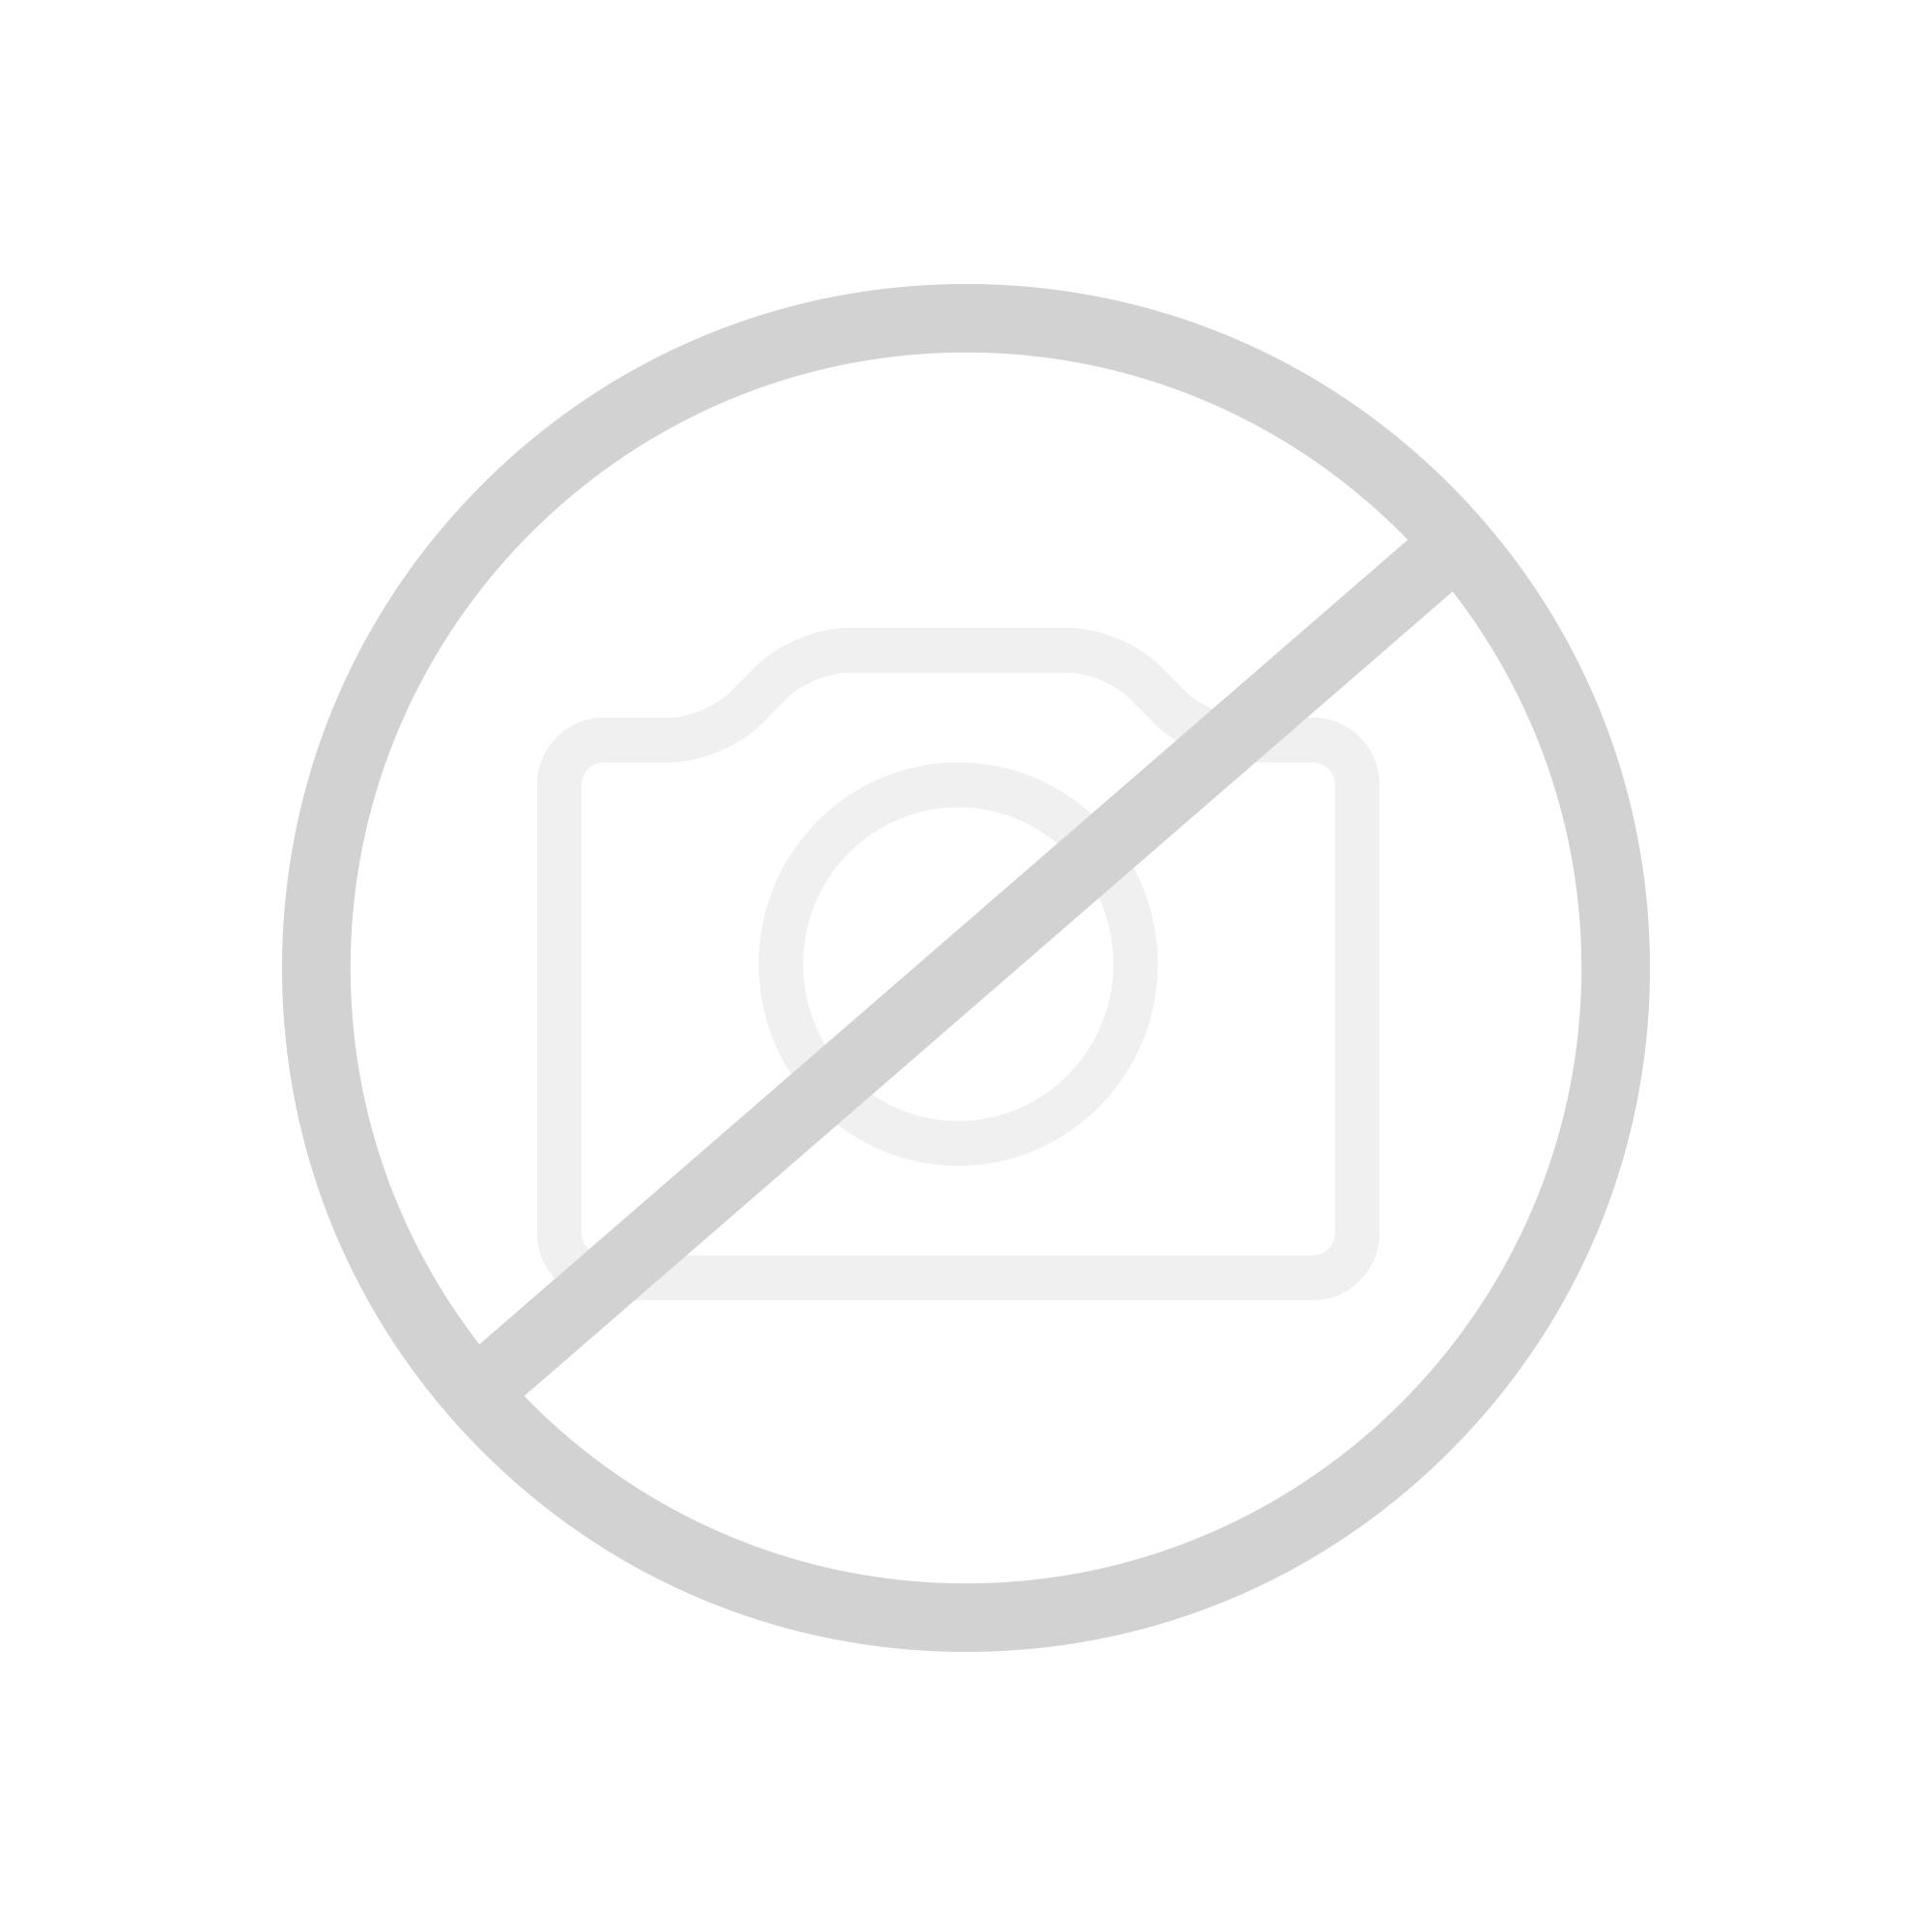 Keuco Edition 11 Schaumseifenspender, komplett